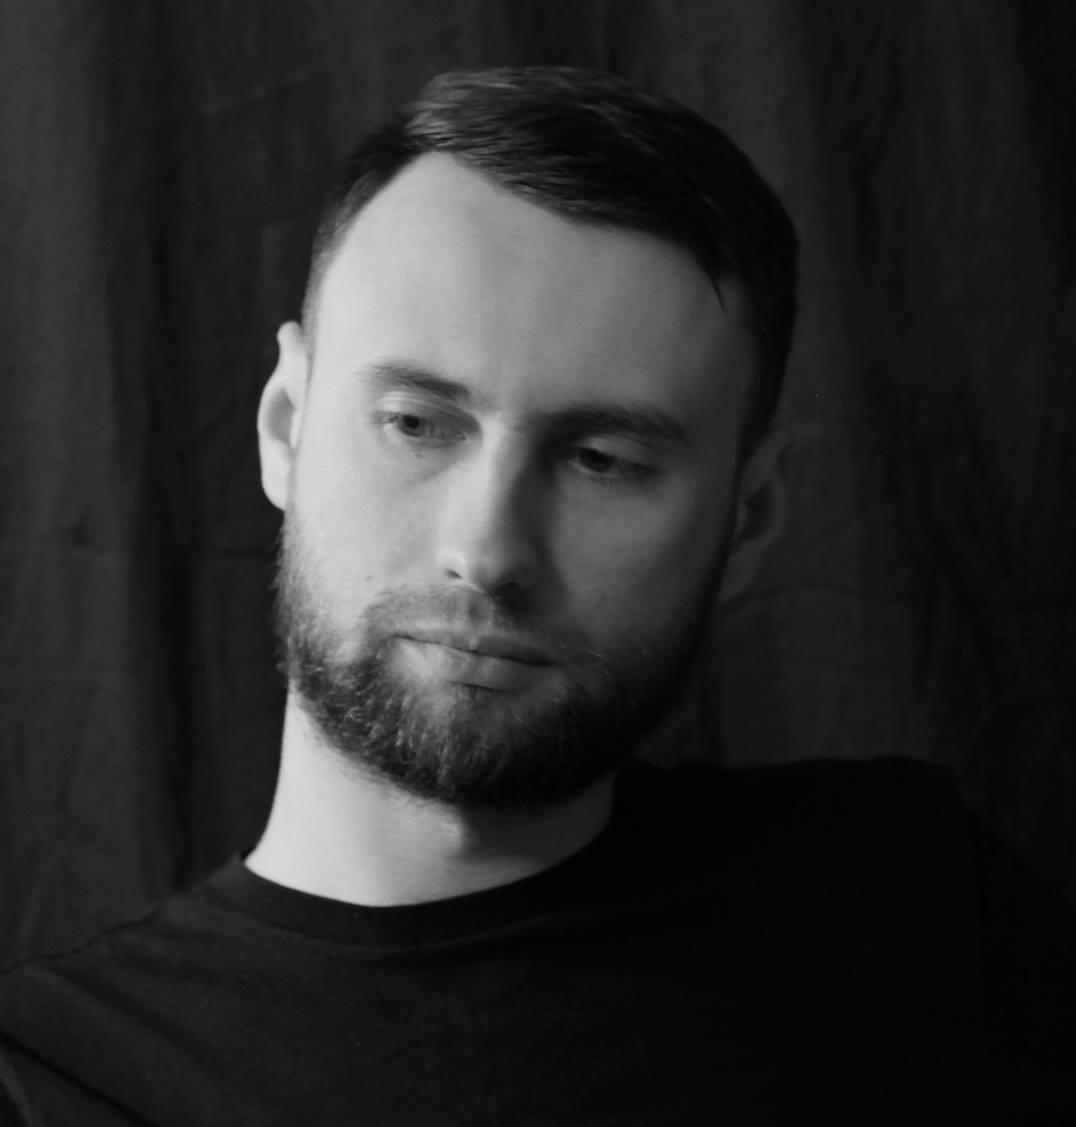 Andrey Severin